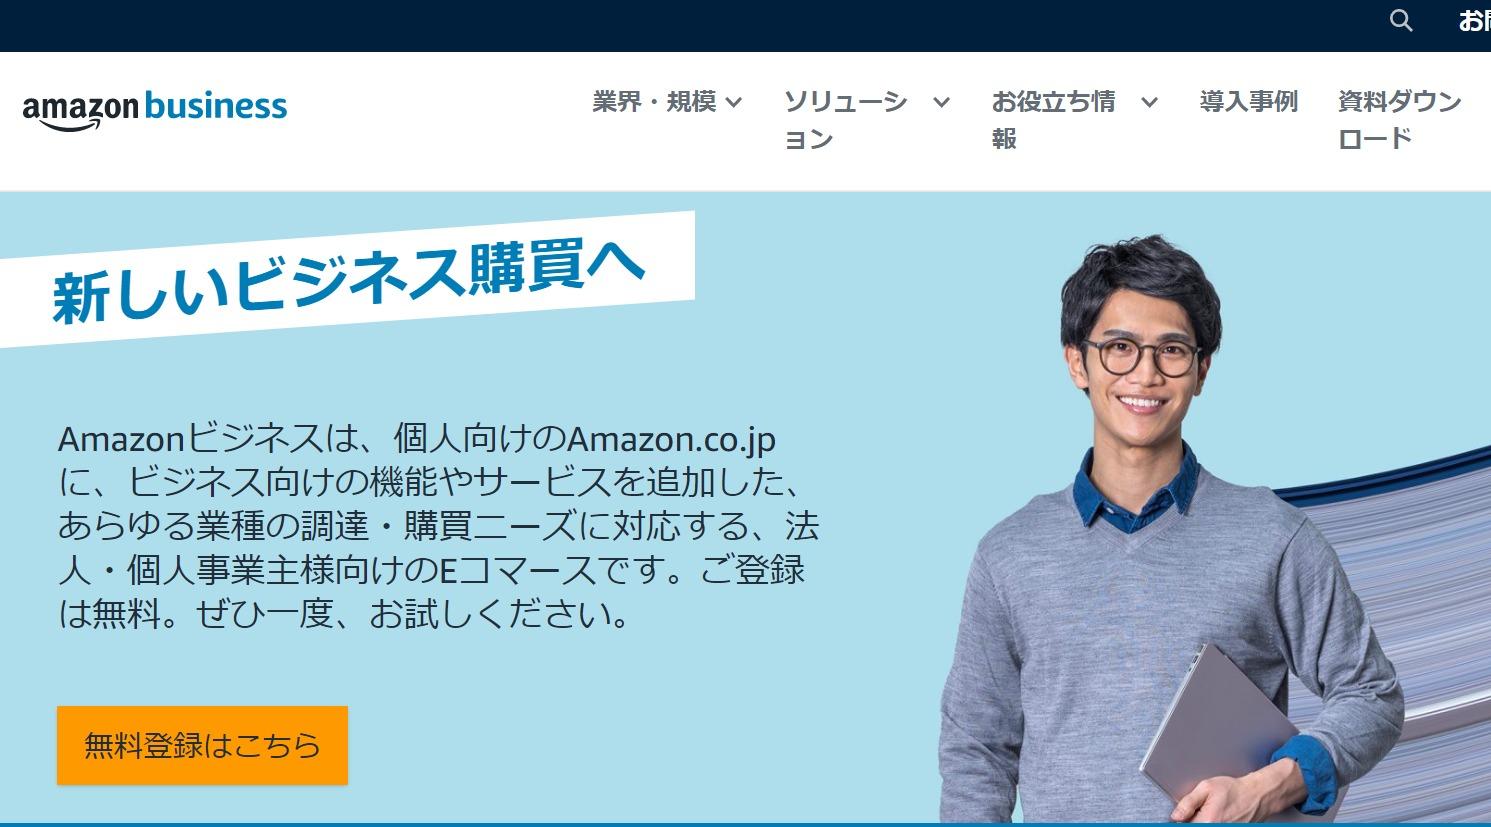 Amazonビジネス(法人契約アカウント)を徹底解説〜請求書払いは?限度額は?見積書は?登録方法は?〜